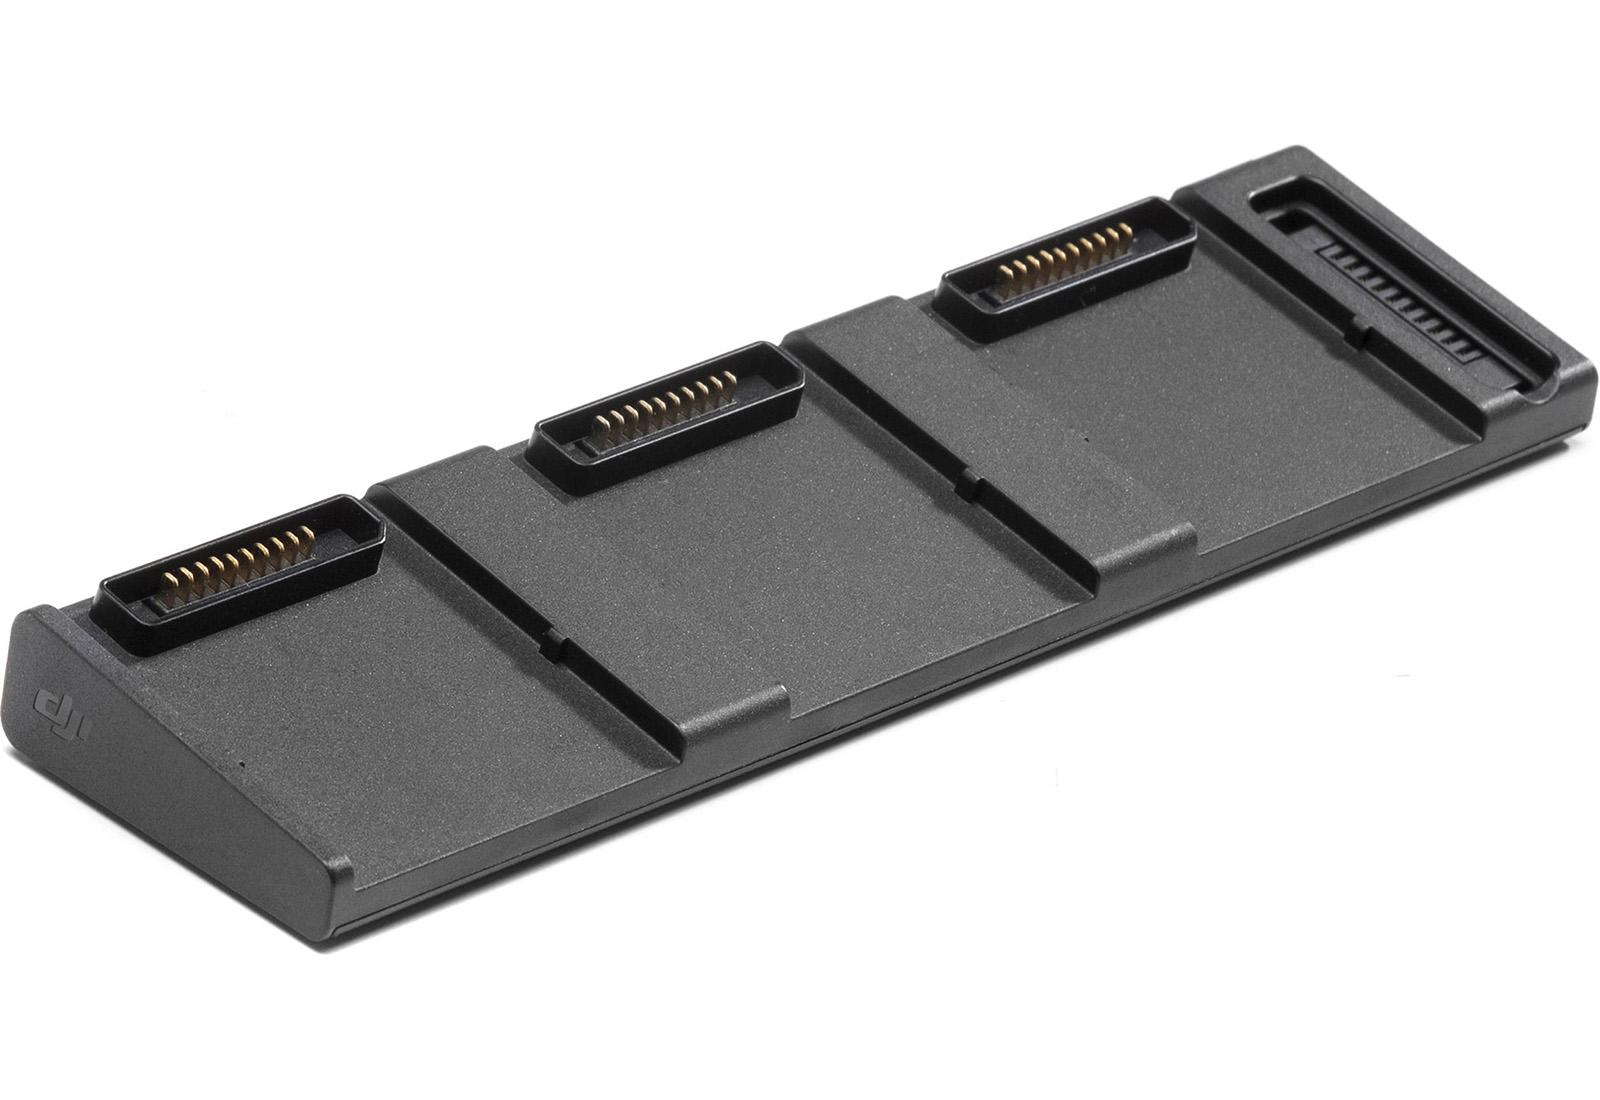 mavic 2 battery charging hub firmware